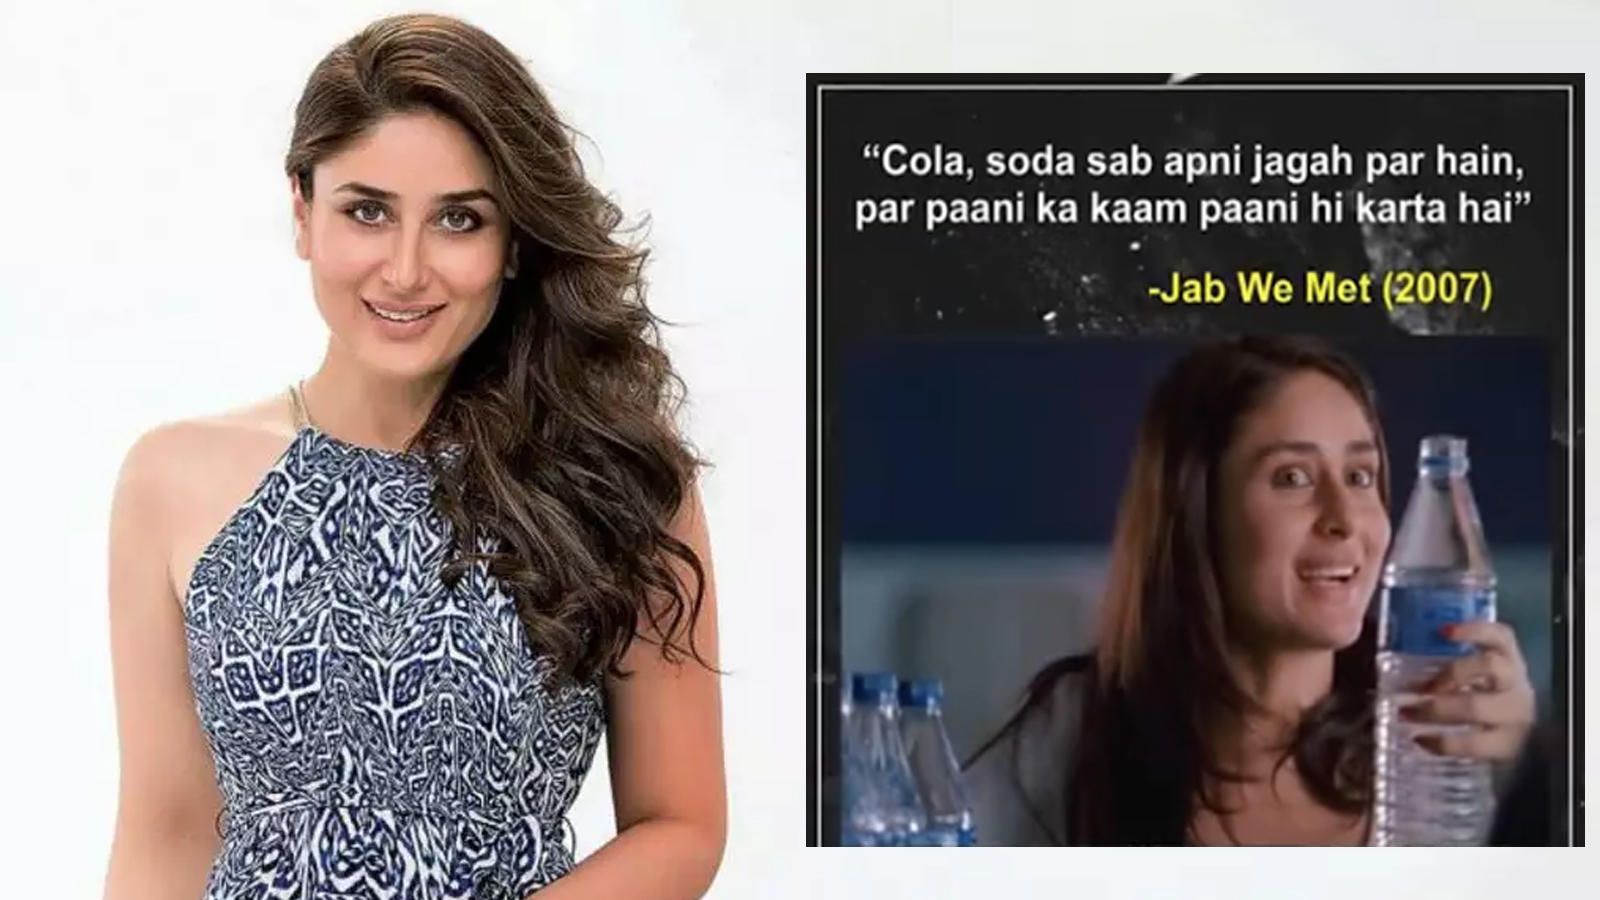 kareena-kapoor-khan-drops-a-jab-we-met-meme-after-cristiano-ronaldo-endorsed-water-over-cola